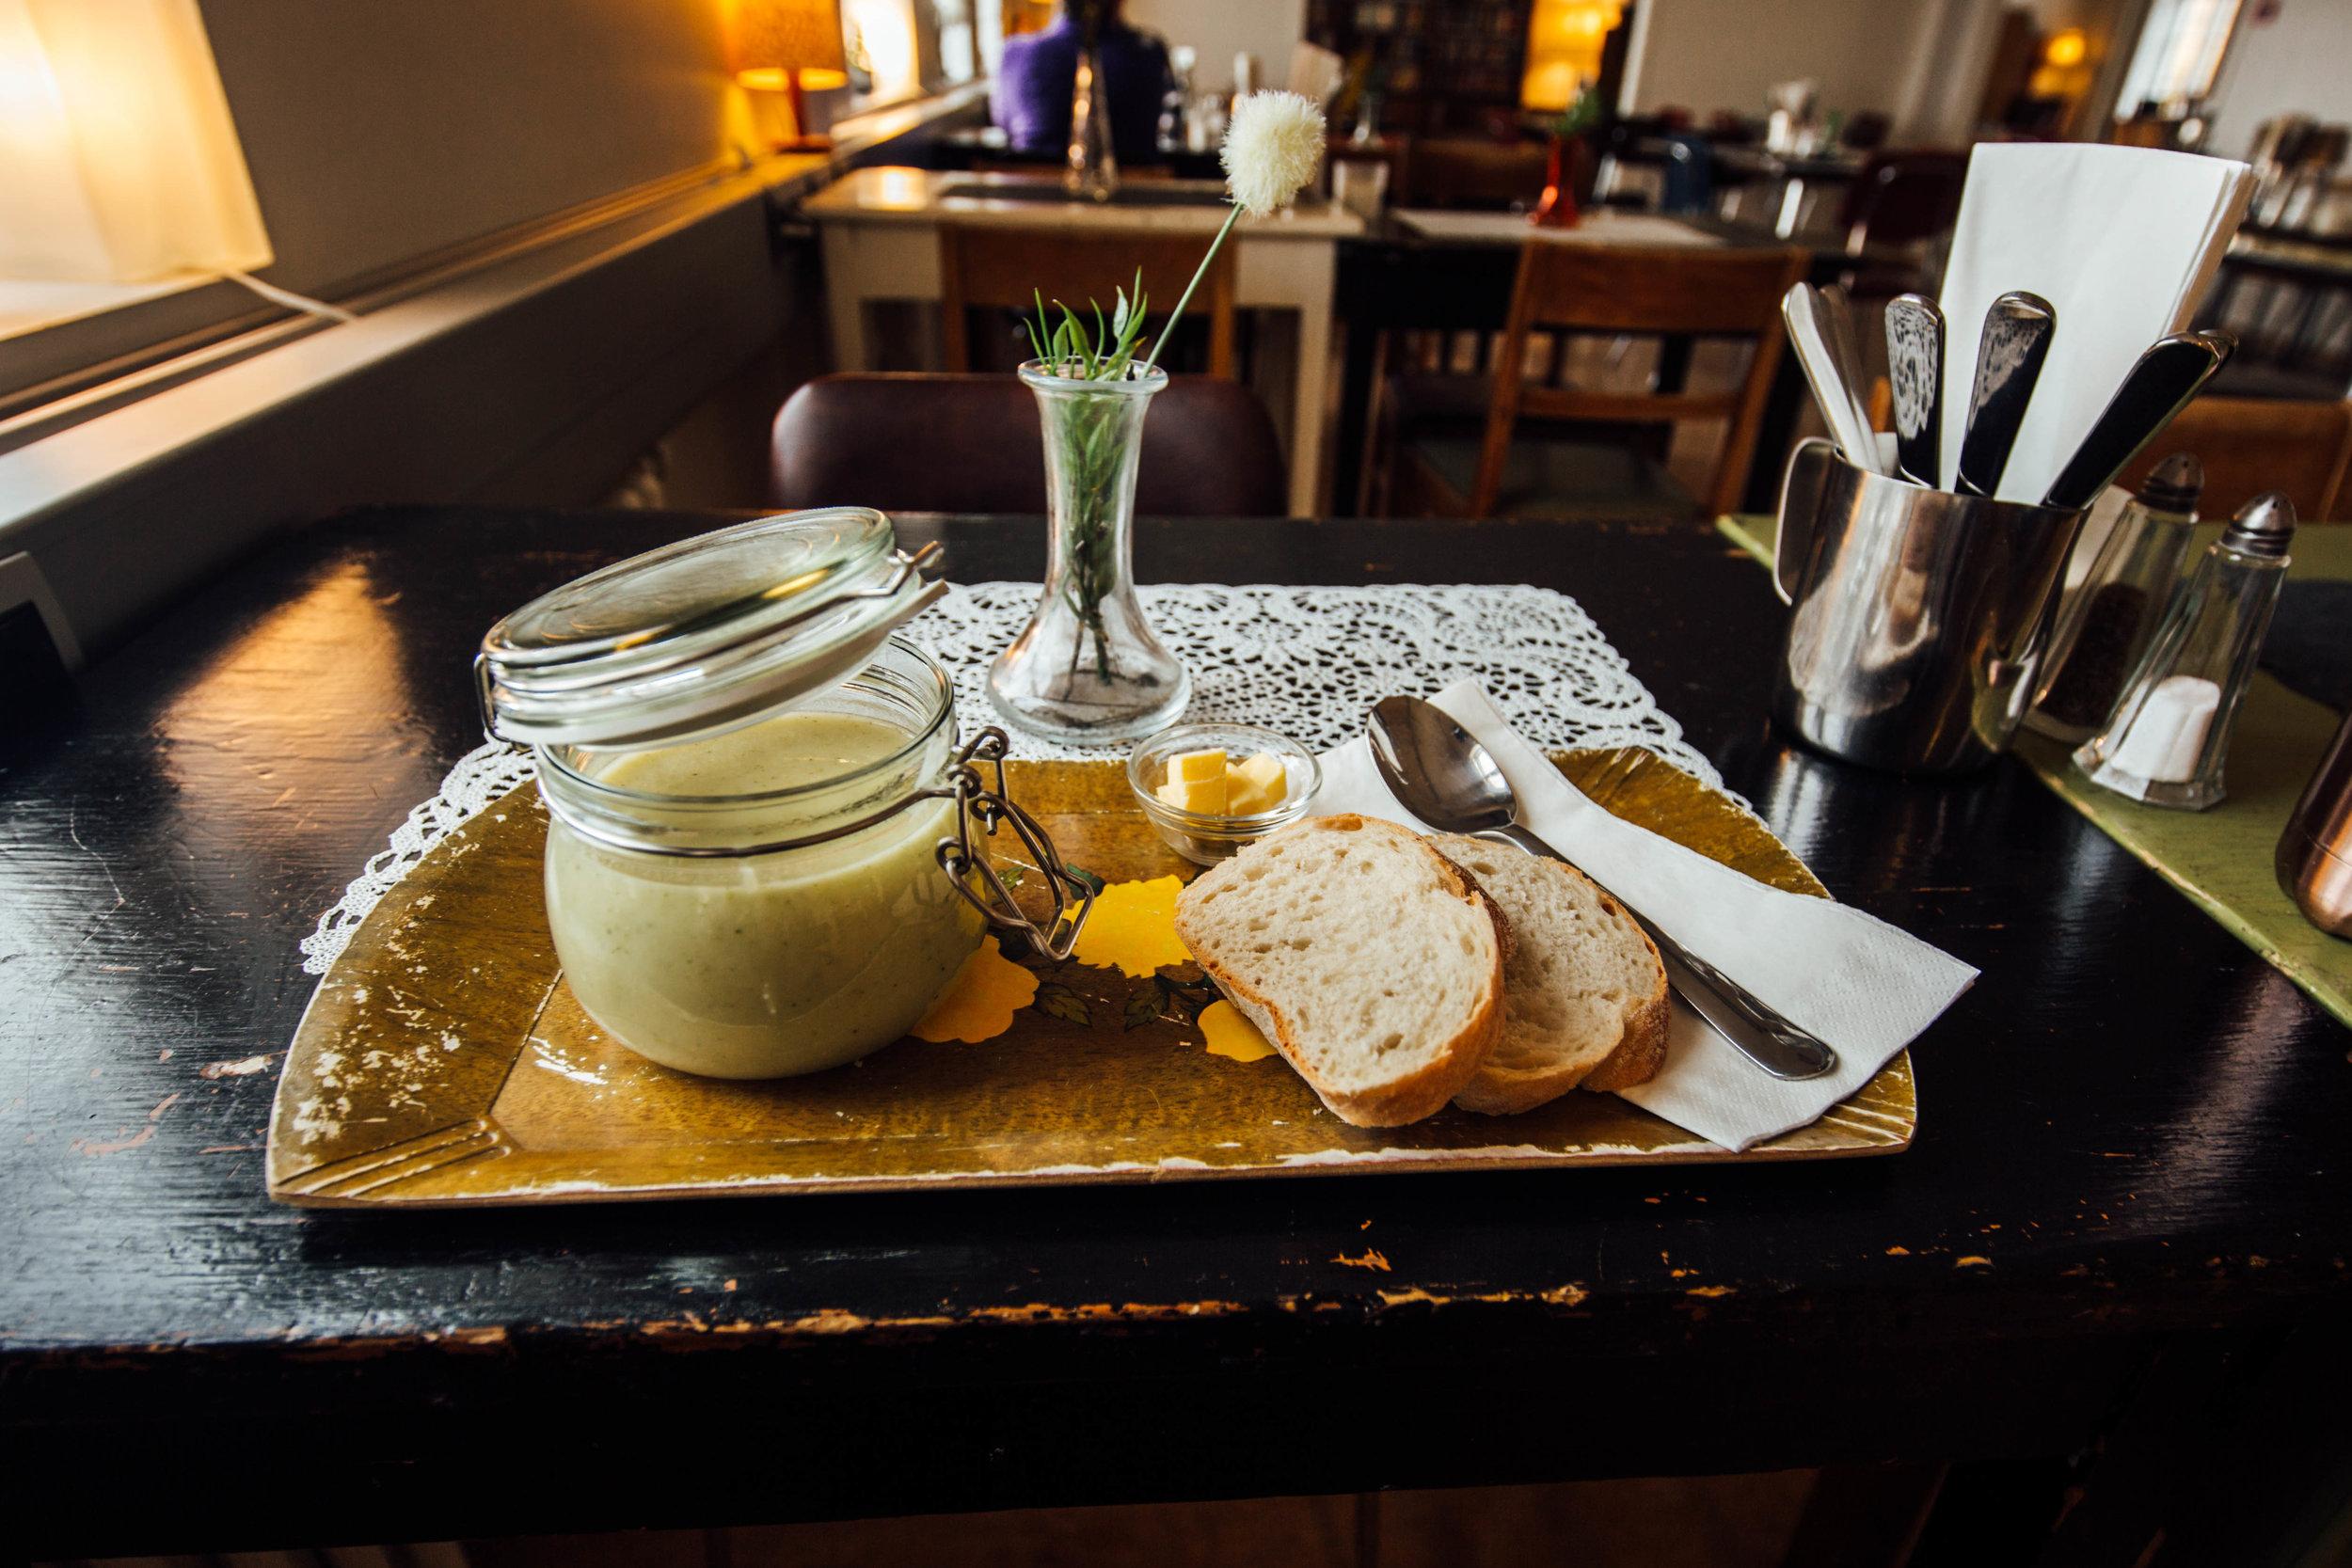 Amazing broccoli and calliflower soup at Heradsskolinn Hostel